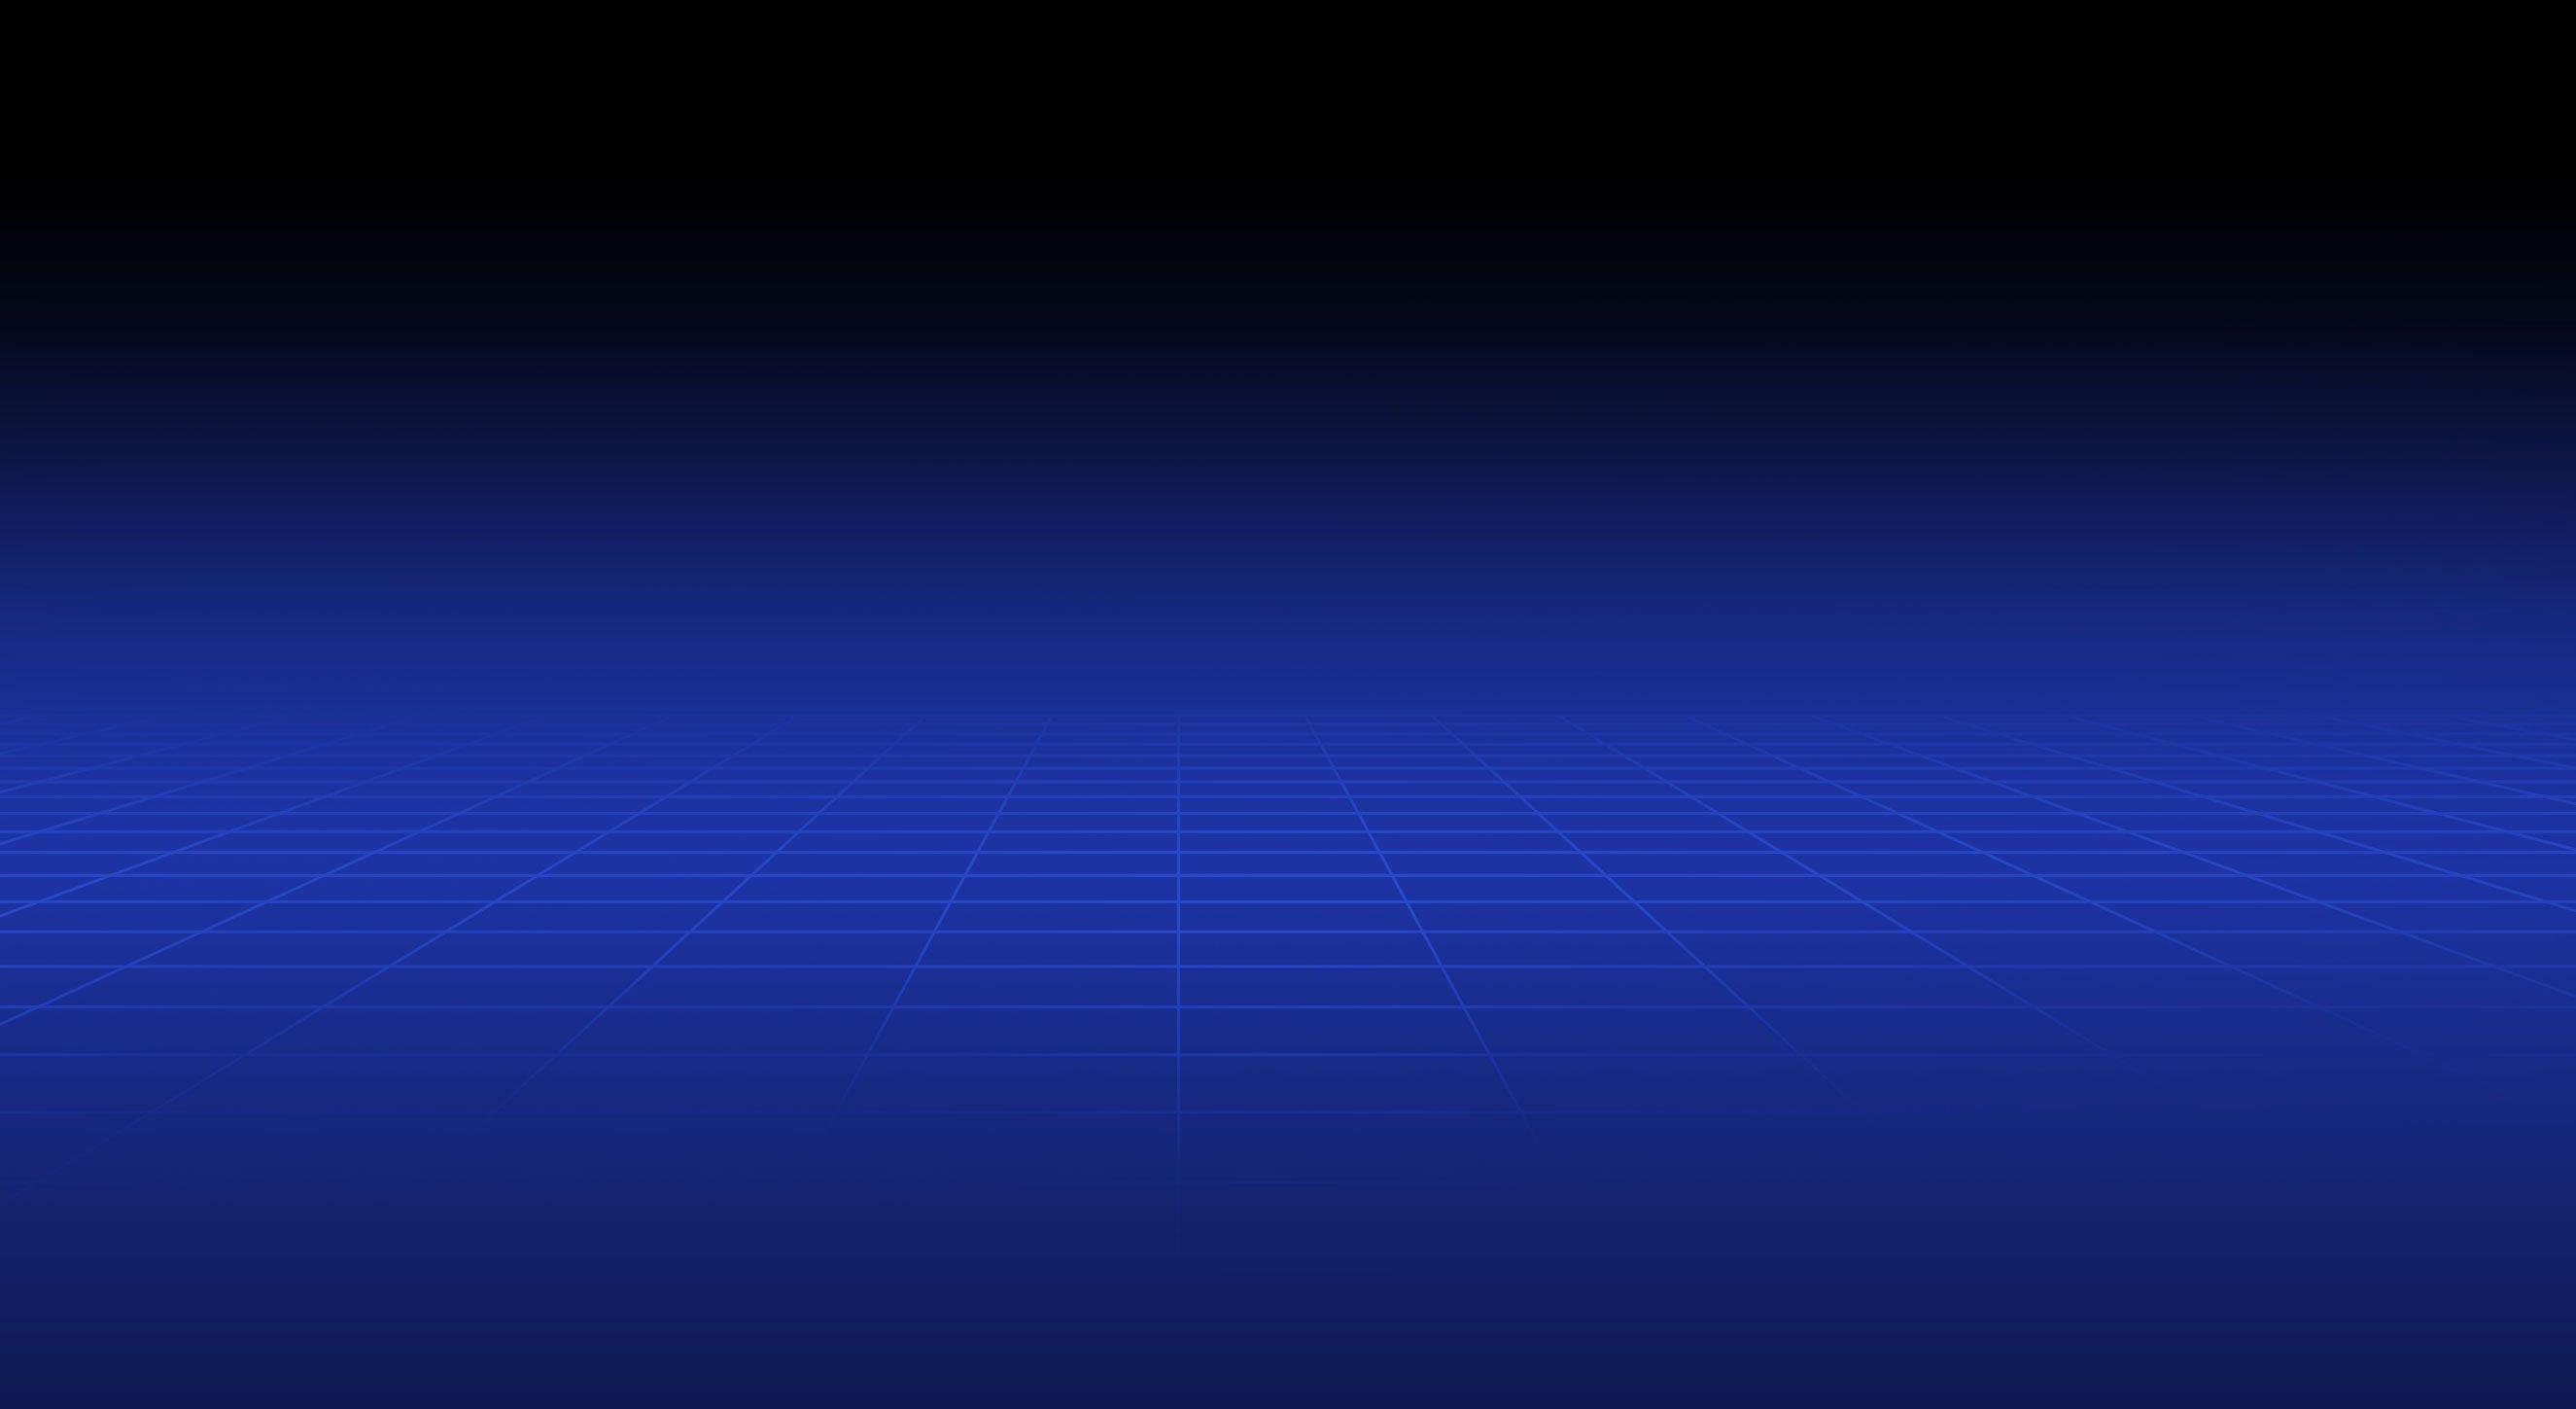 Aritize360_background_Grid_2560x1440